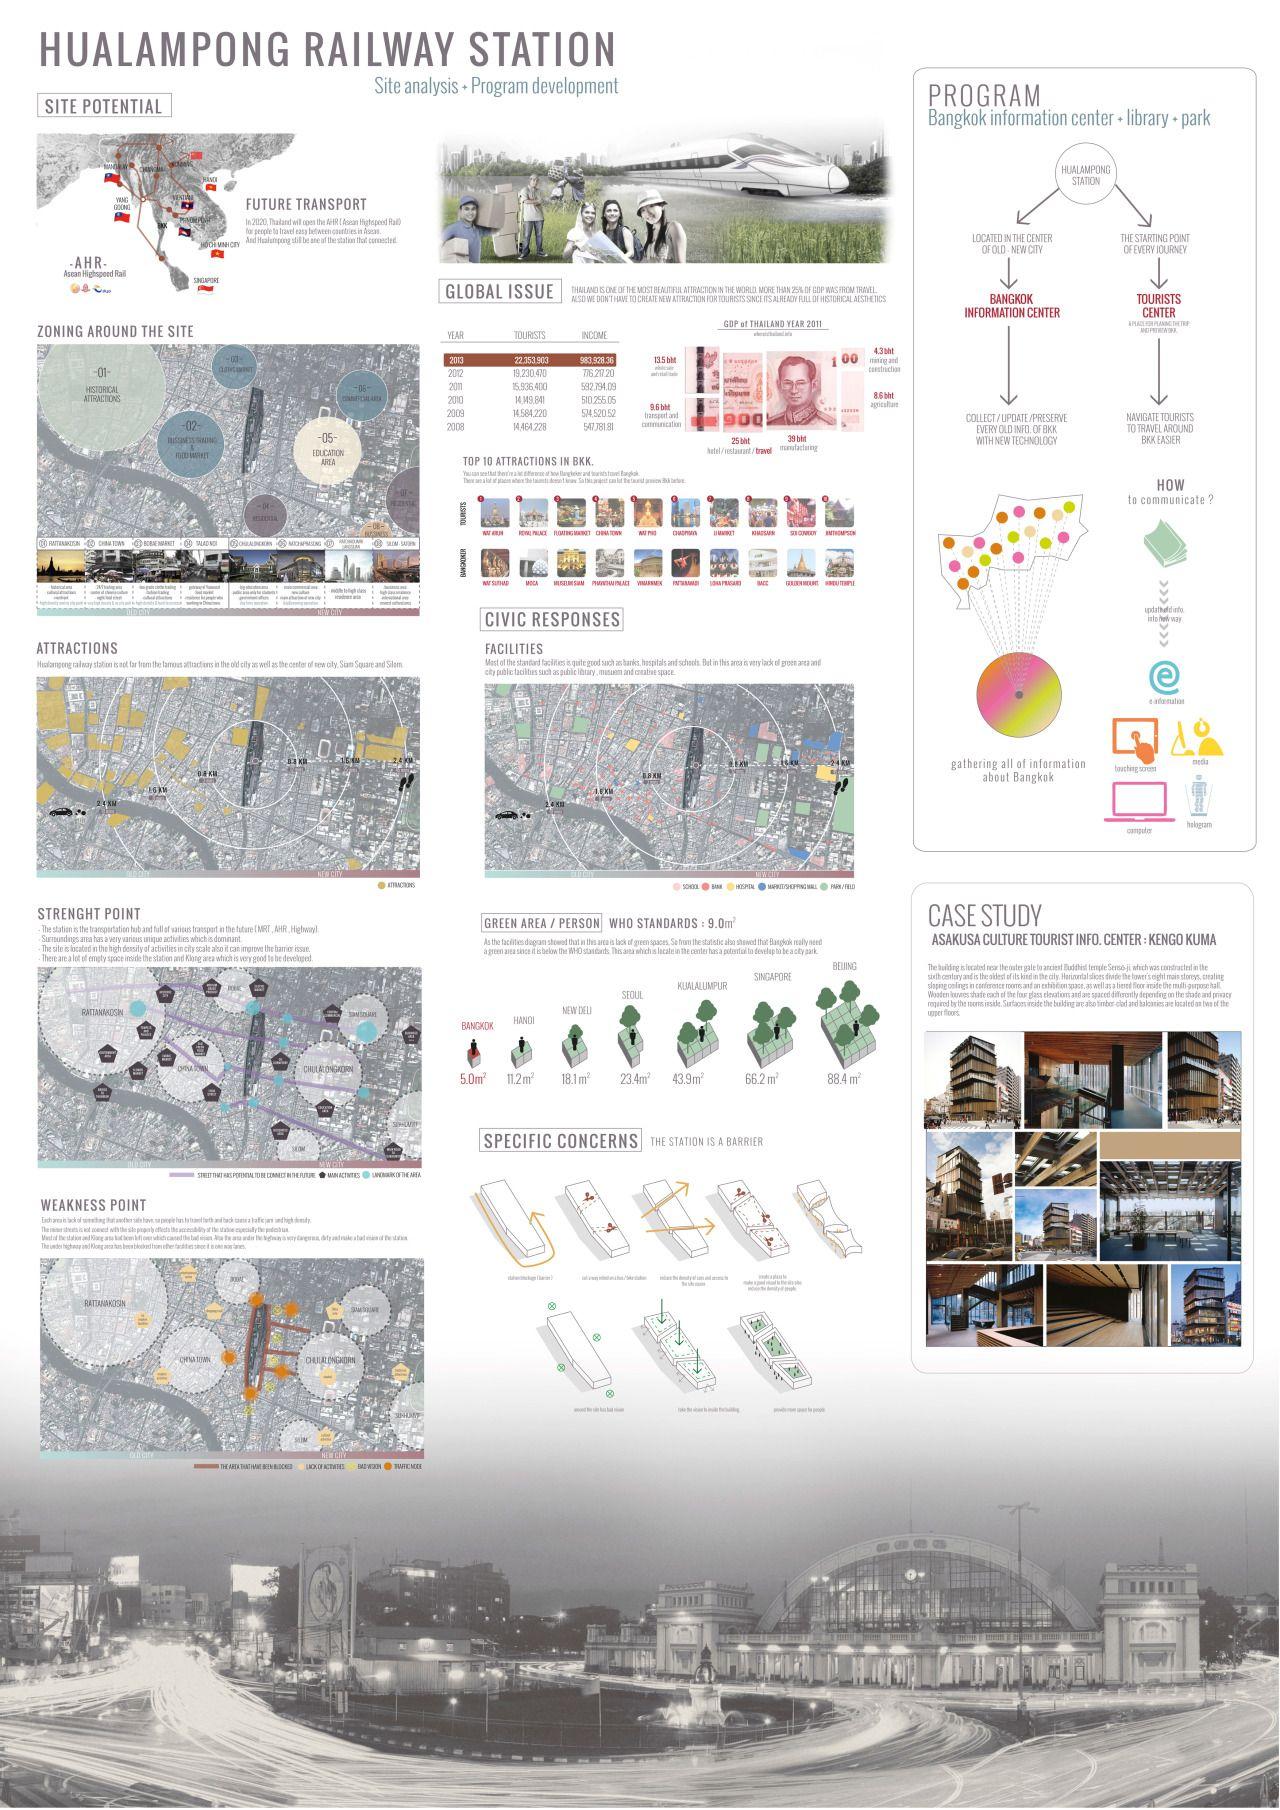 Site analysis and development program bangkok infomation for Study landscape design